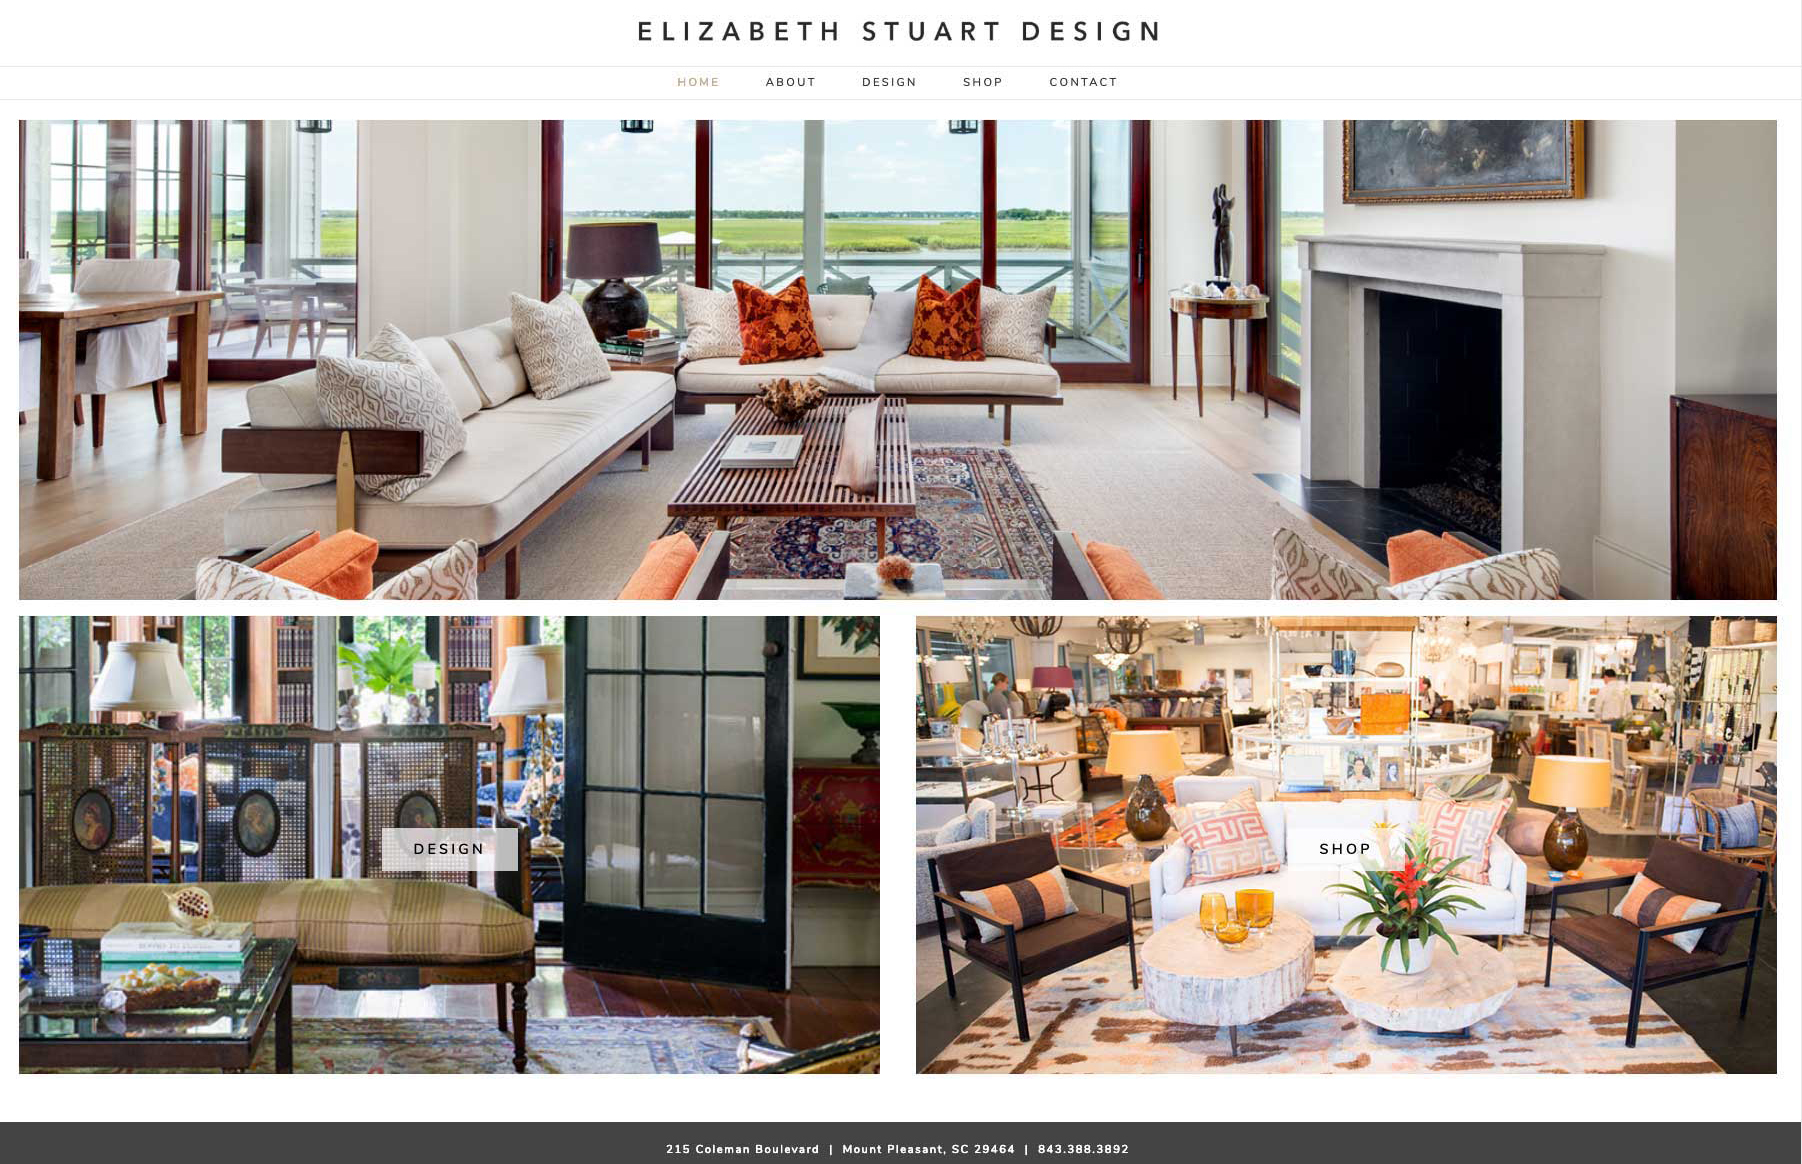 Elizabeth Stuart Design Wordpress website by Caitilin McPhillips.